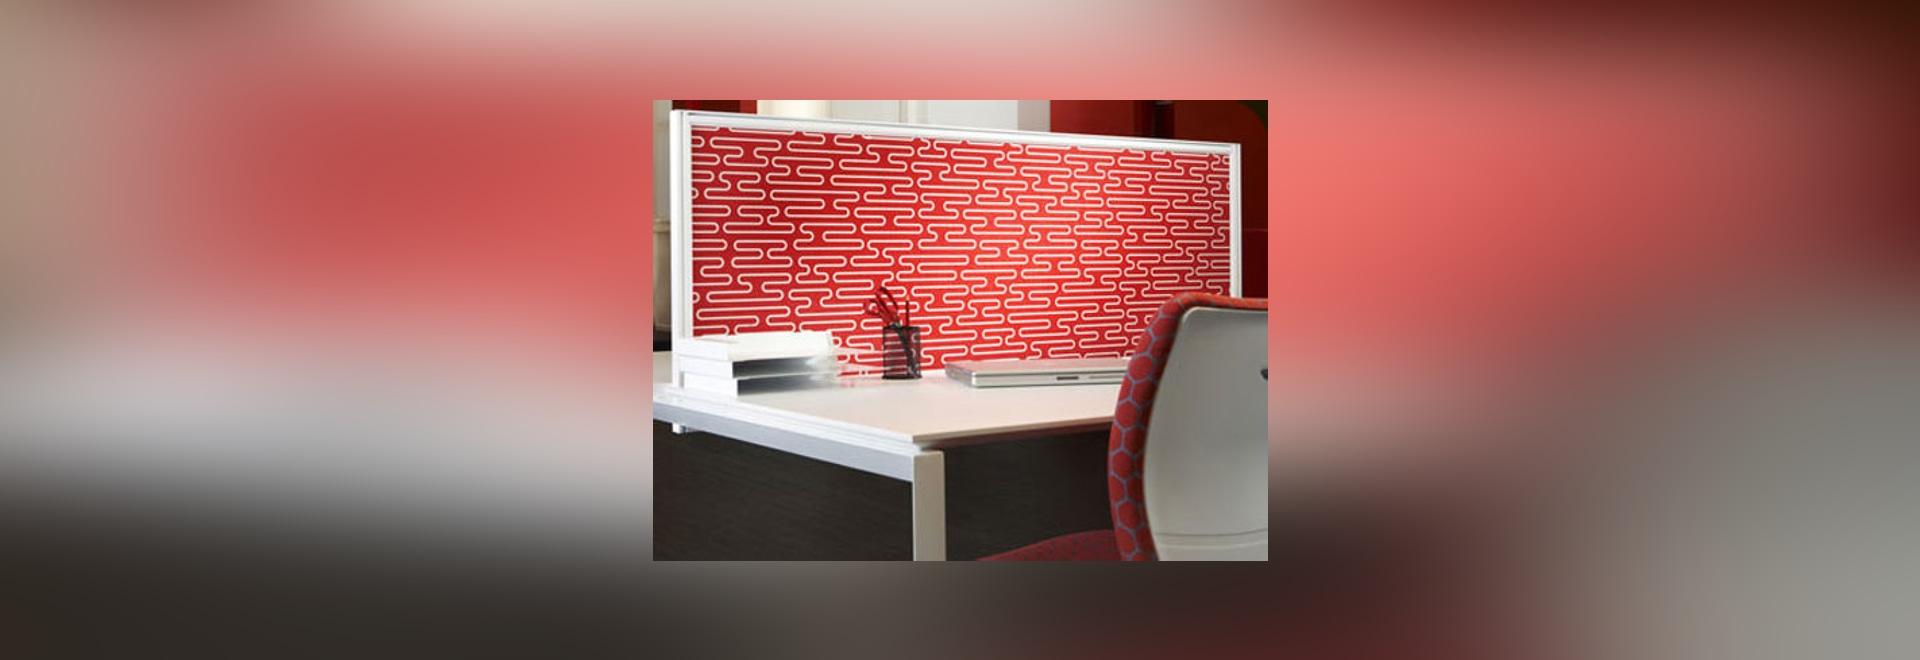 Kirei echopanel geometric tiles building for health - 258 Ripple By Kirei Usa